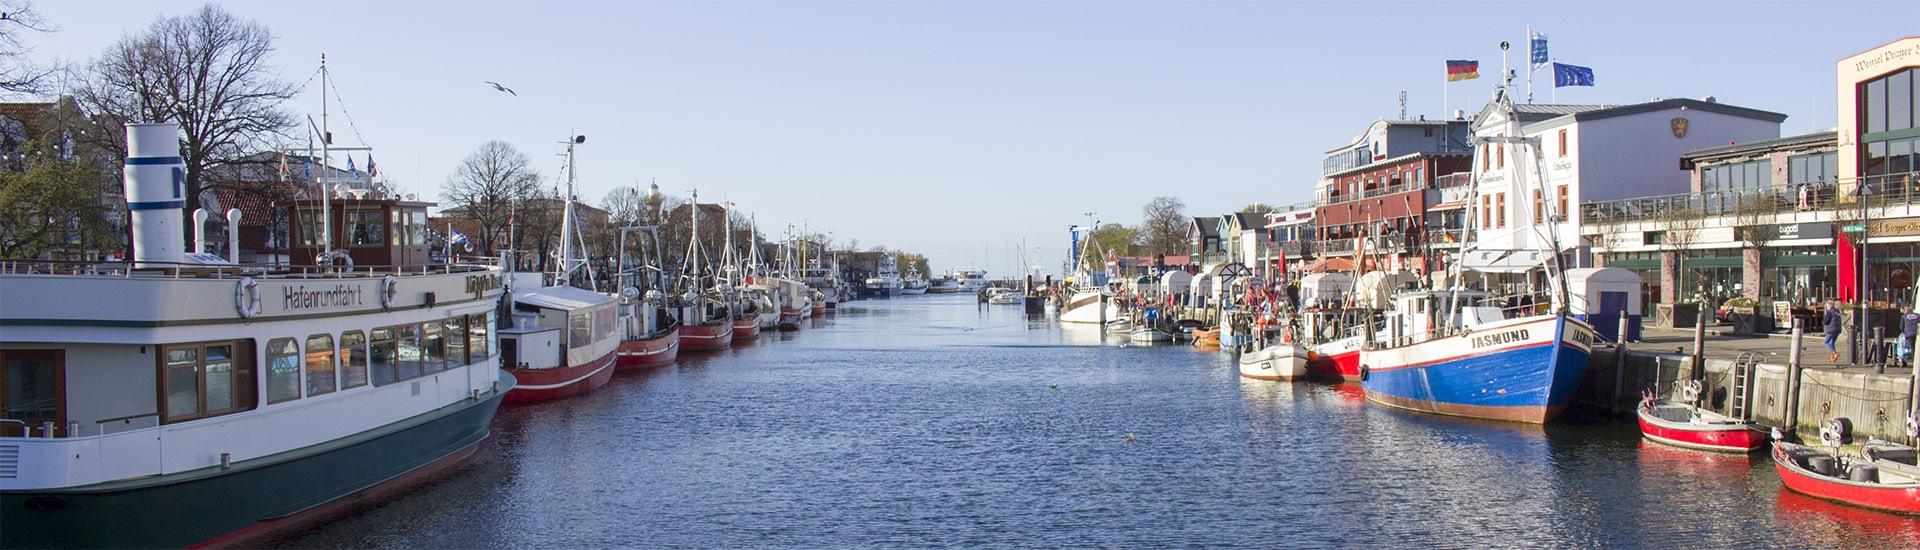 SightRunning Rostock - Stadtführung anders - Spurensuche in Warnemünde